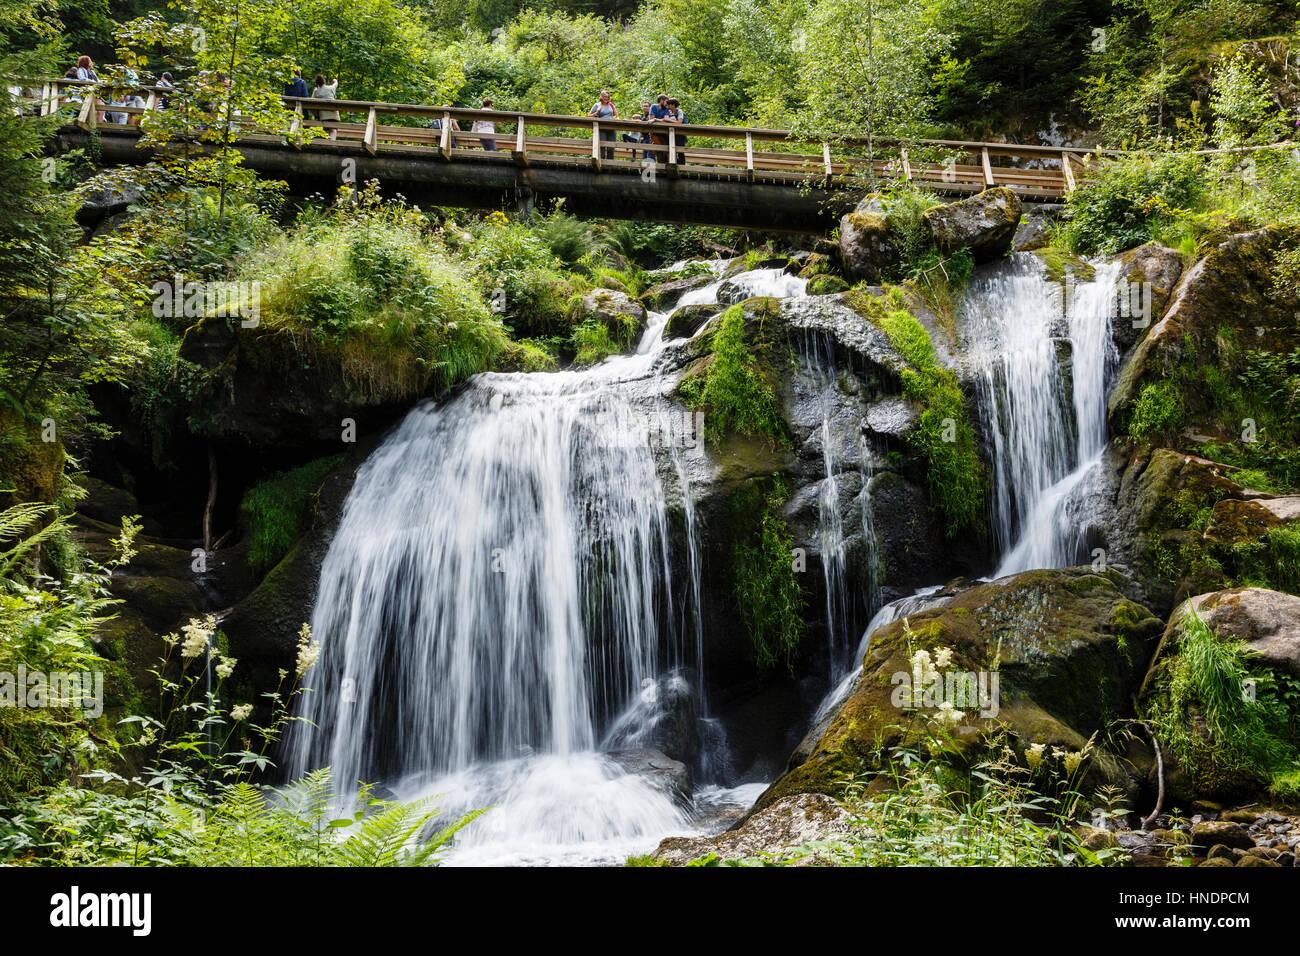 Triberg Waterfalls, Black Forest, Germany Stock Photo